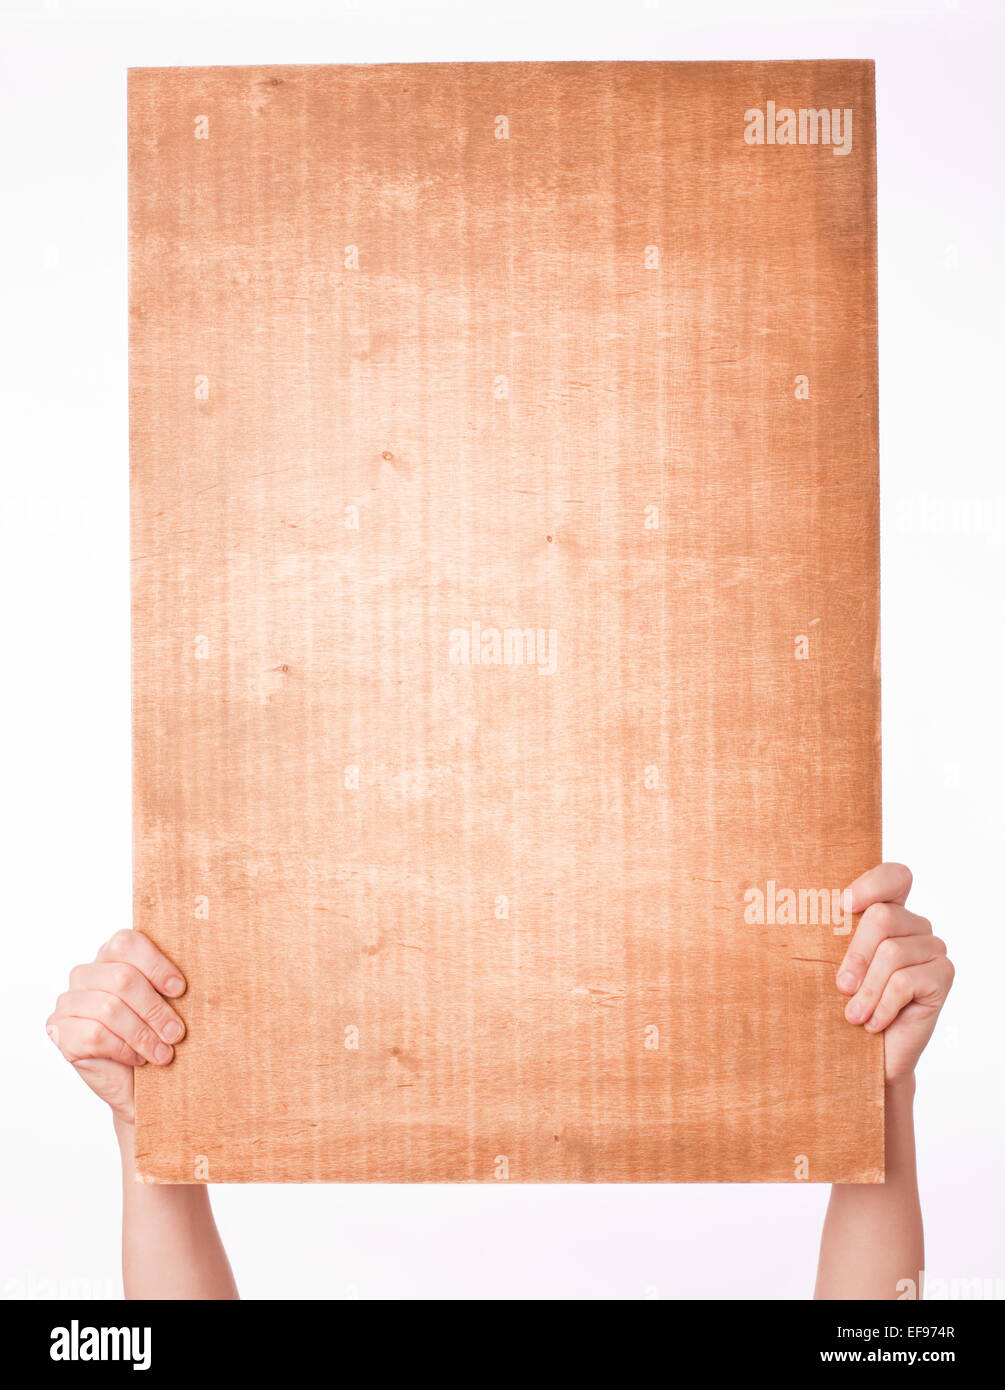 hands holding veneer sheet over white background - Stock Image